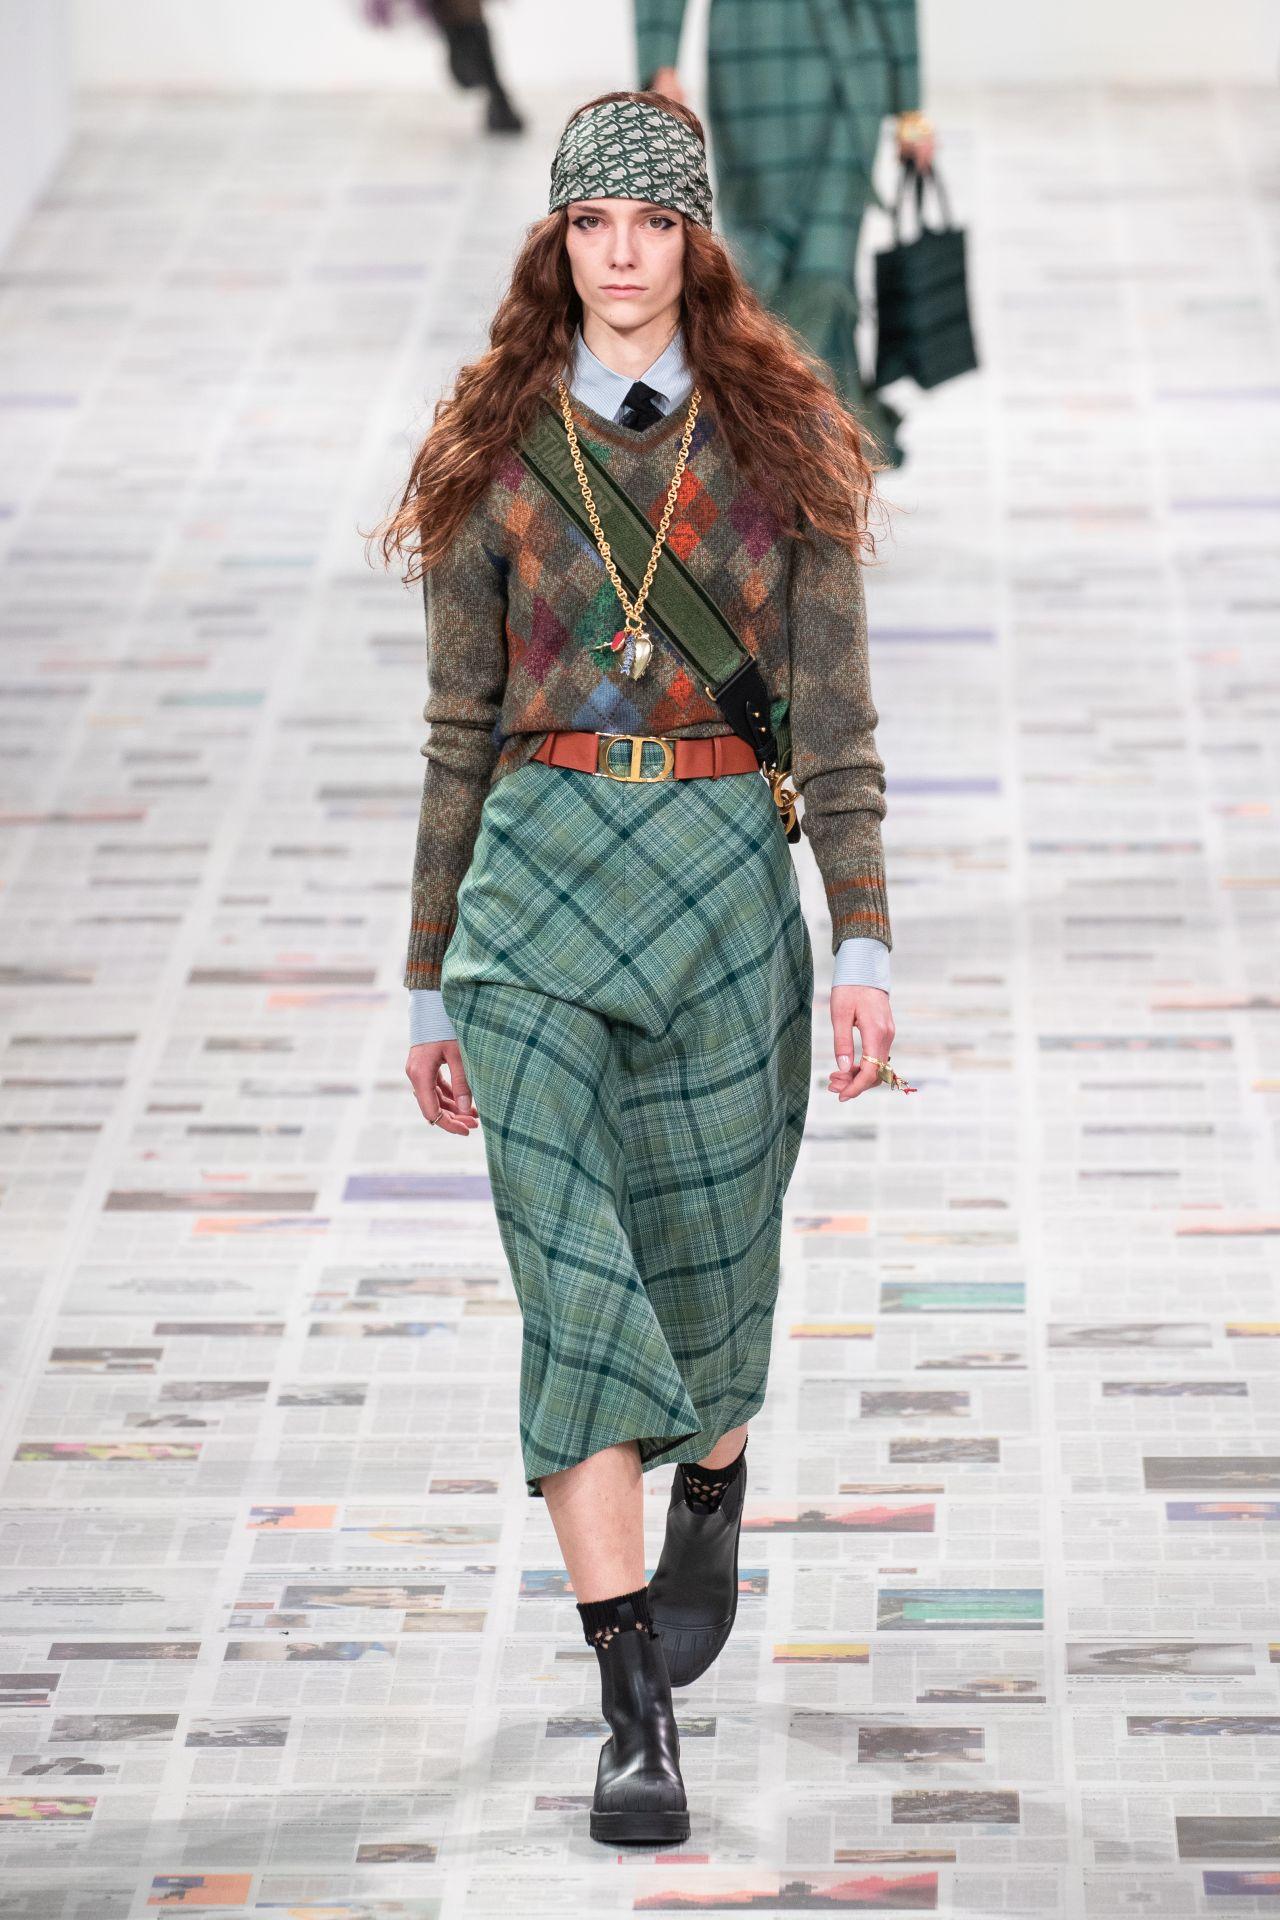 5. kép: Dior (Fotó: Victor Boyko/Getty Images)